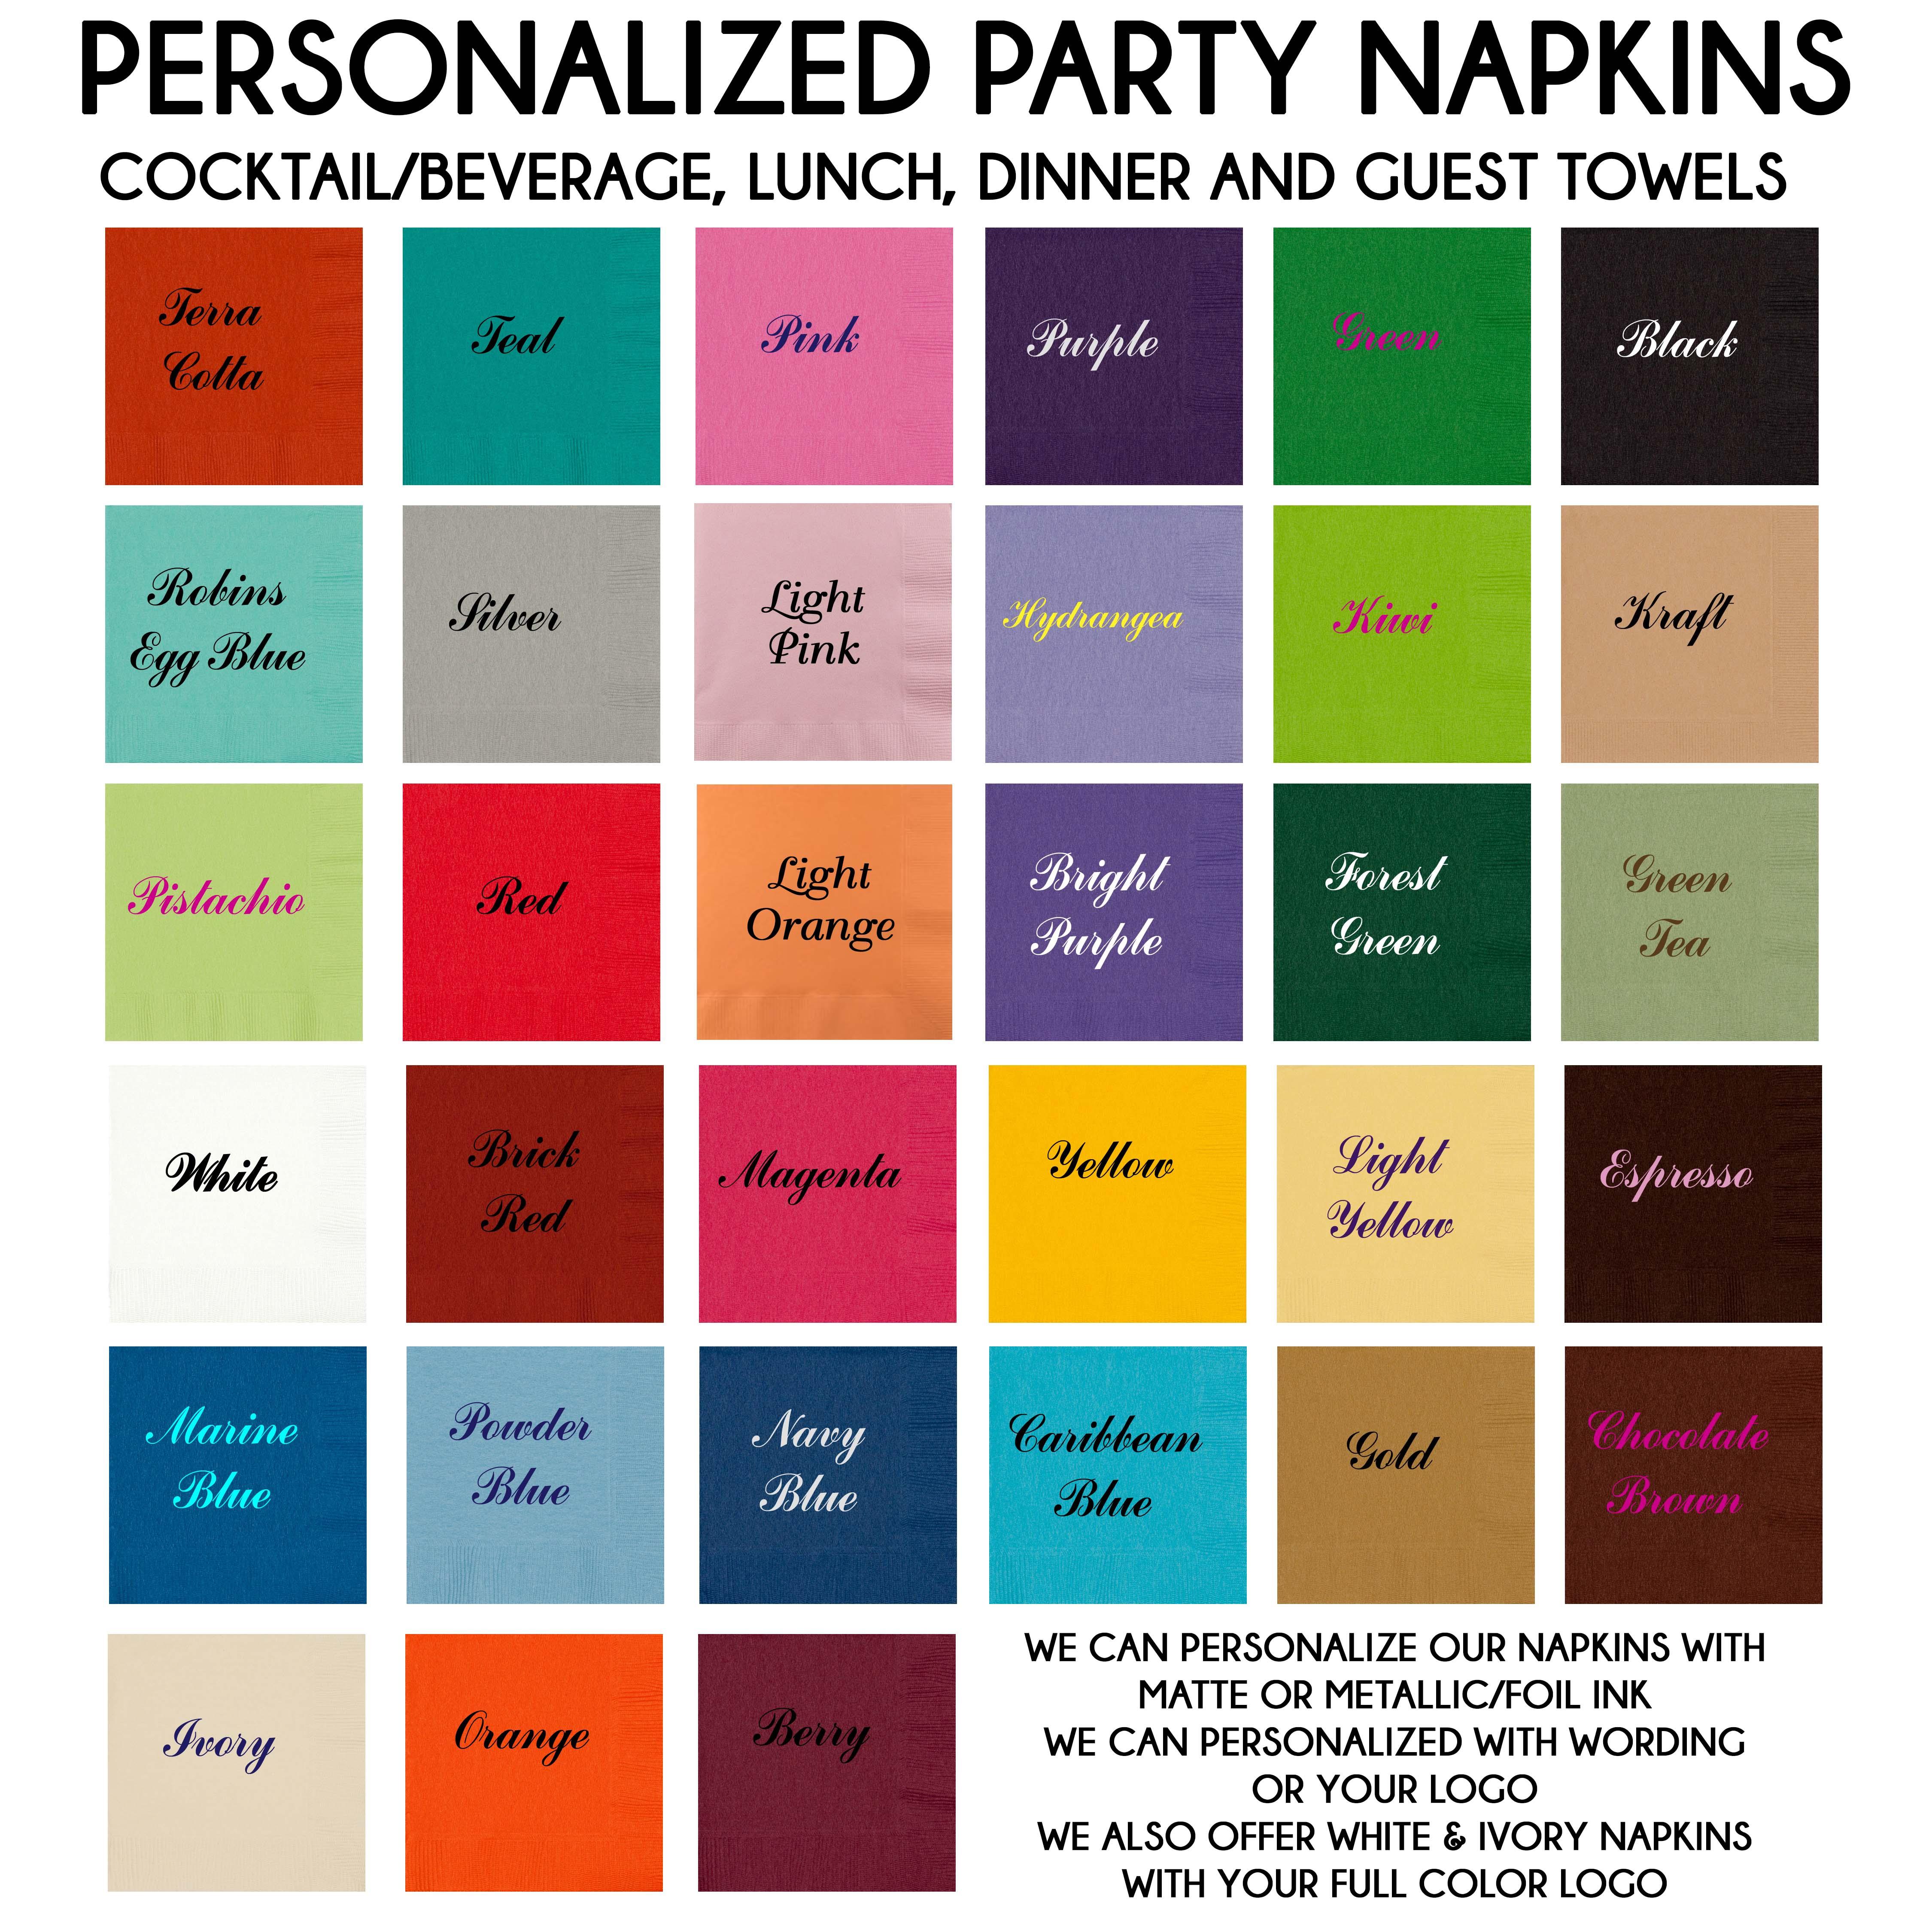 Custom Printed Napkins For Weddings Bar Mitzvah Bat Mitzvah Cutie Patootie Creations